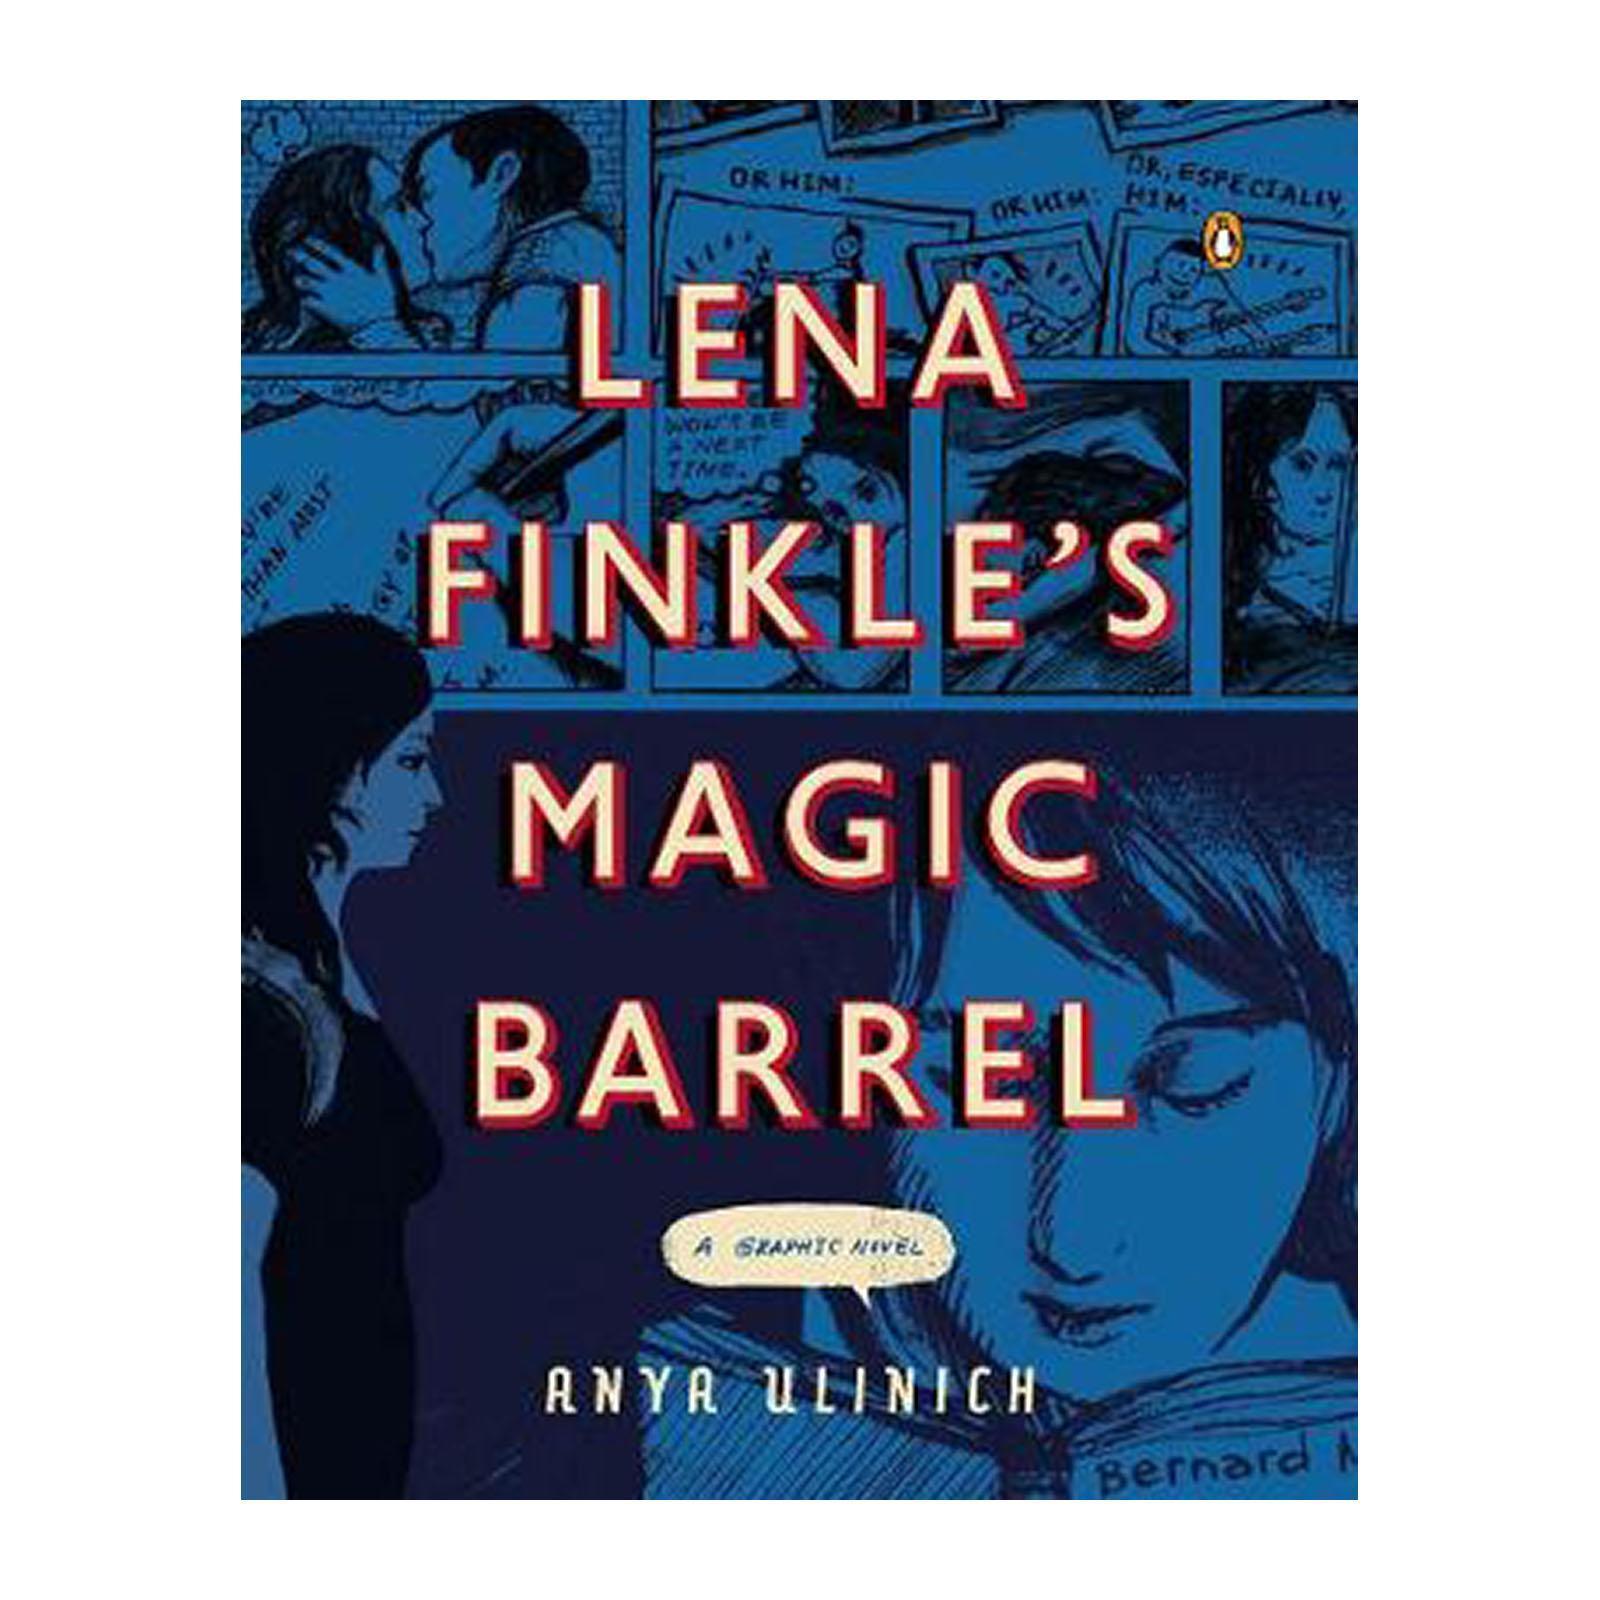 Lena Finkles Magic Barrel: A Graphic Novel (Paperback)